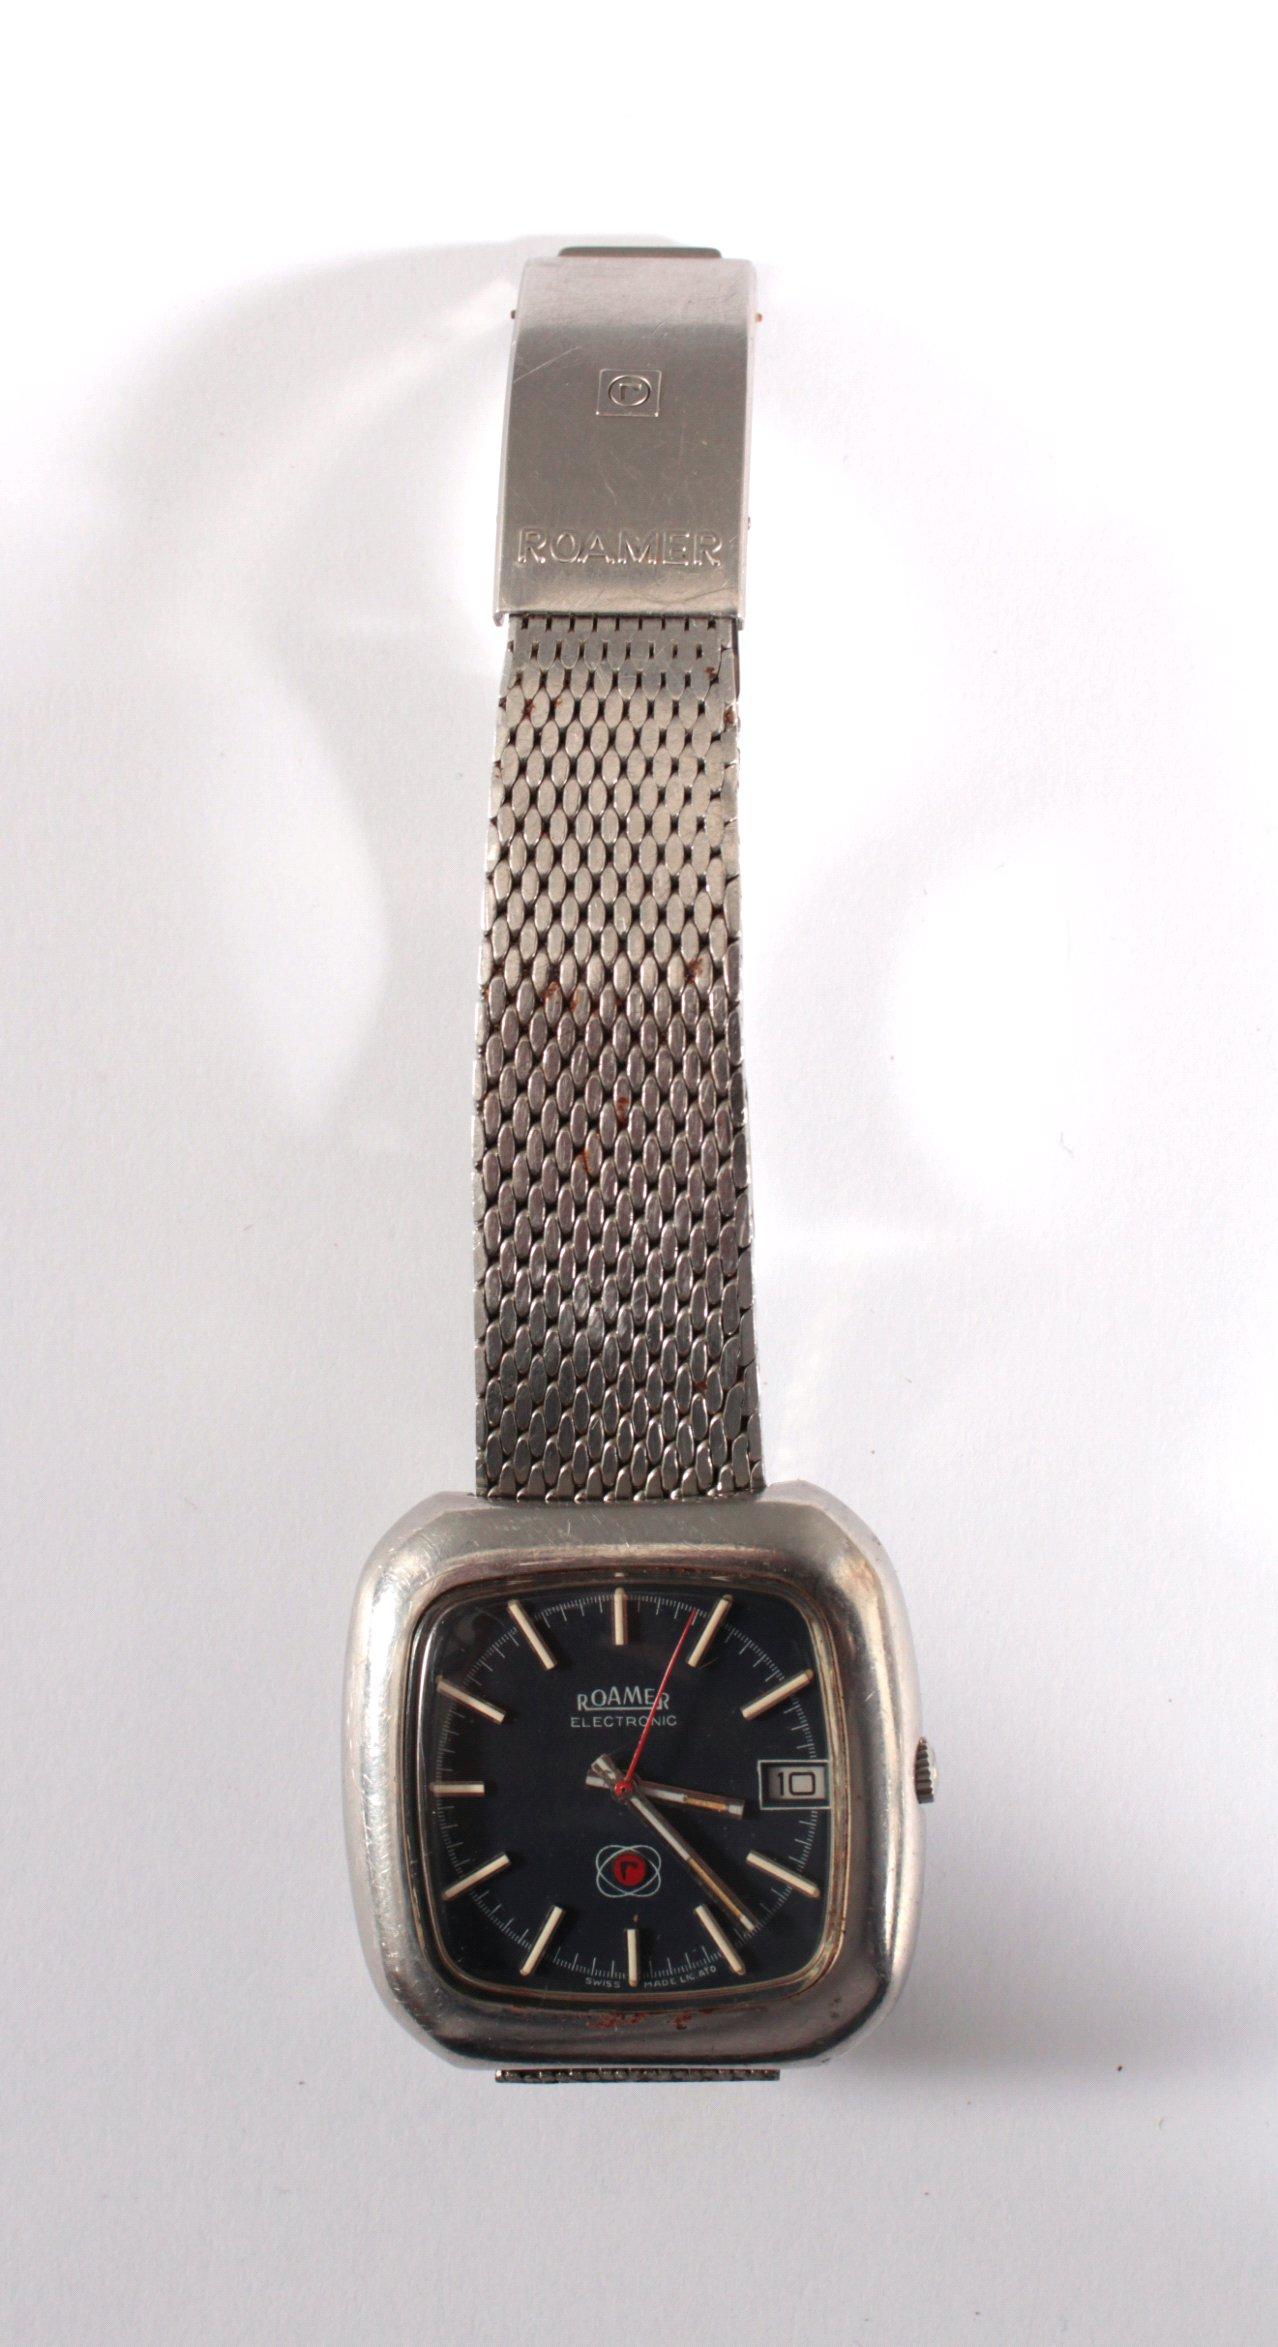 Herrenarmbanduhr der Marke Roamer aus den 80er Jahren-2